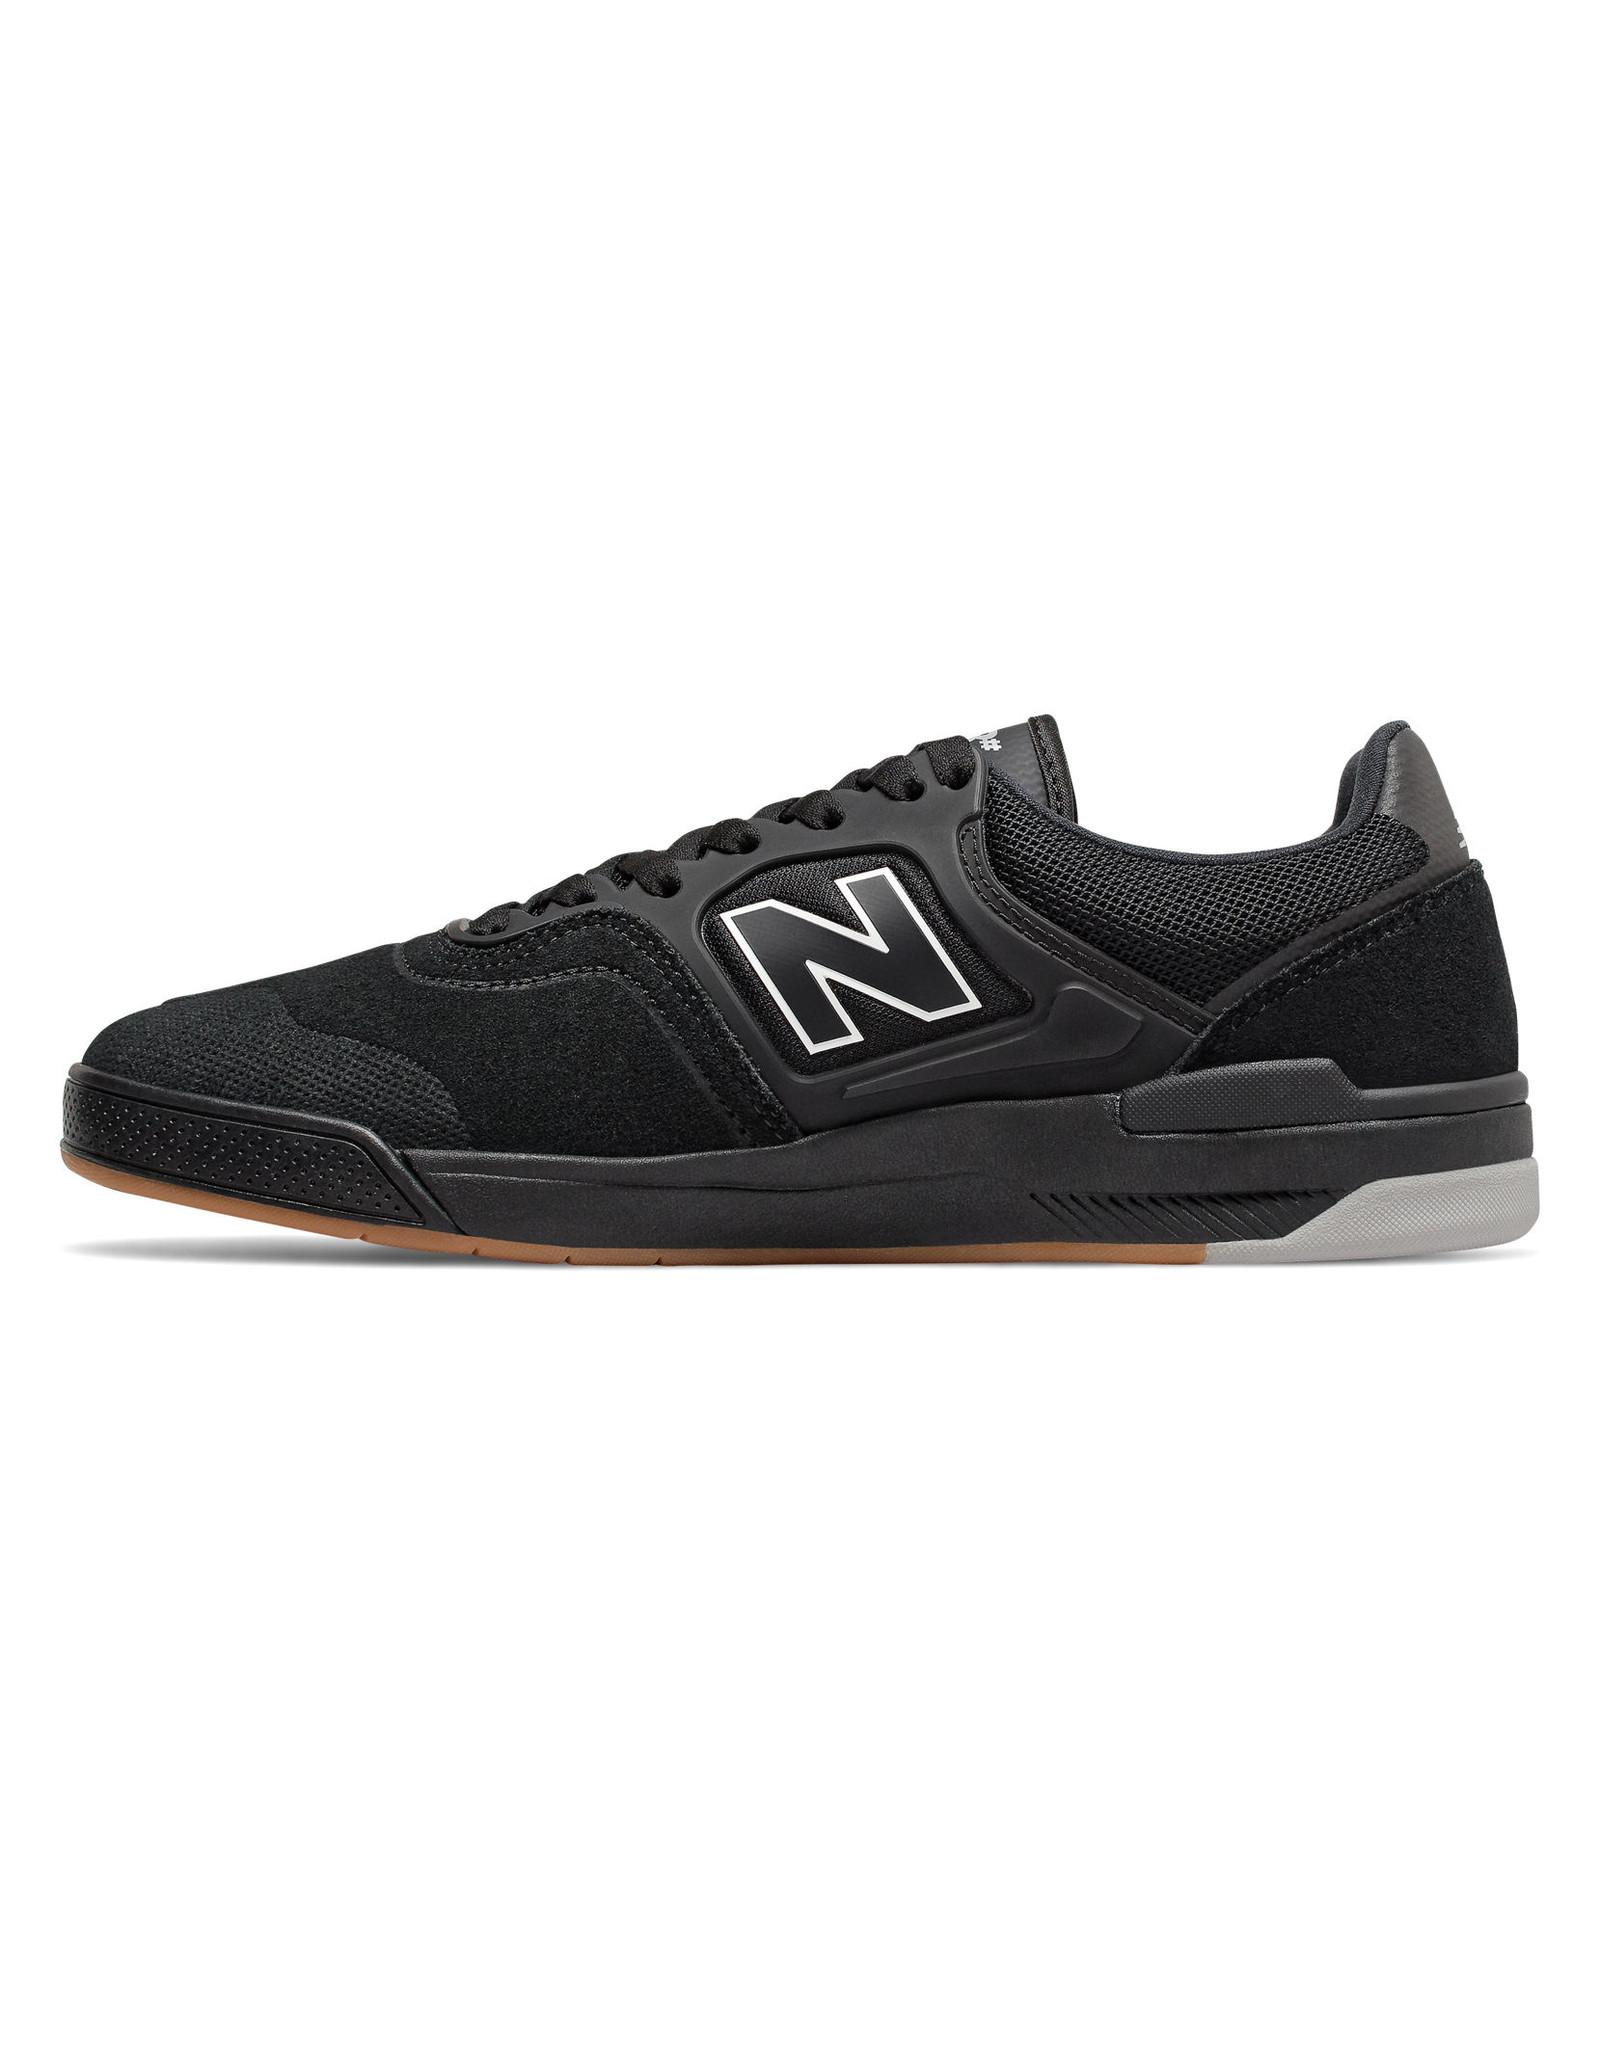 NEW BALANCE NEW BALANCE - 913 - BLACK